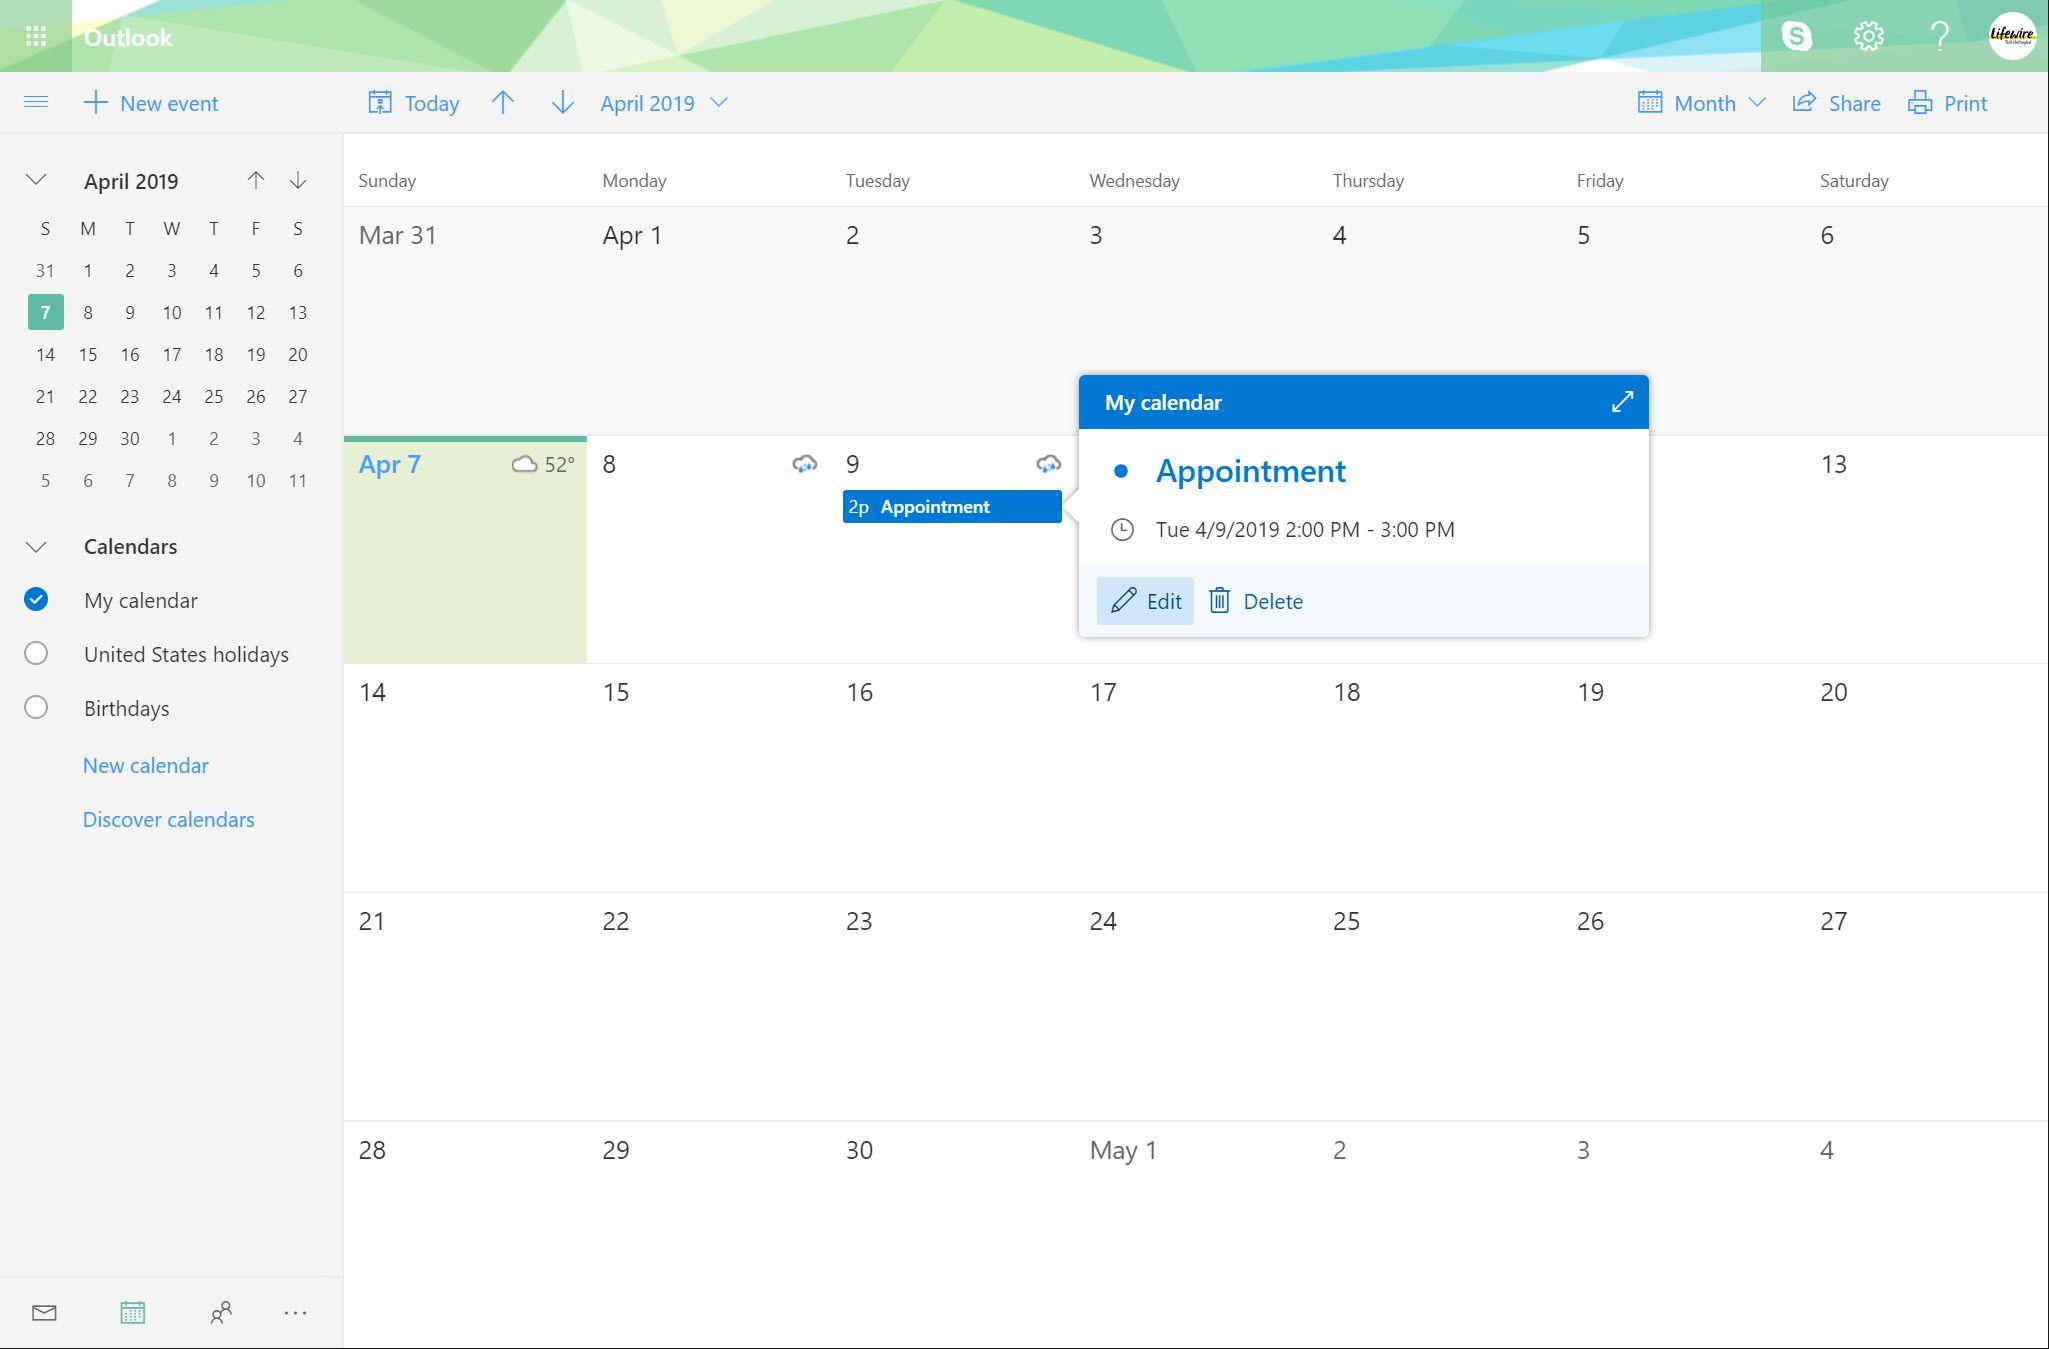 Outlook.com calendar event selected